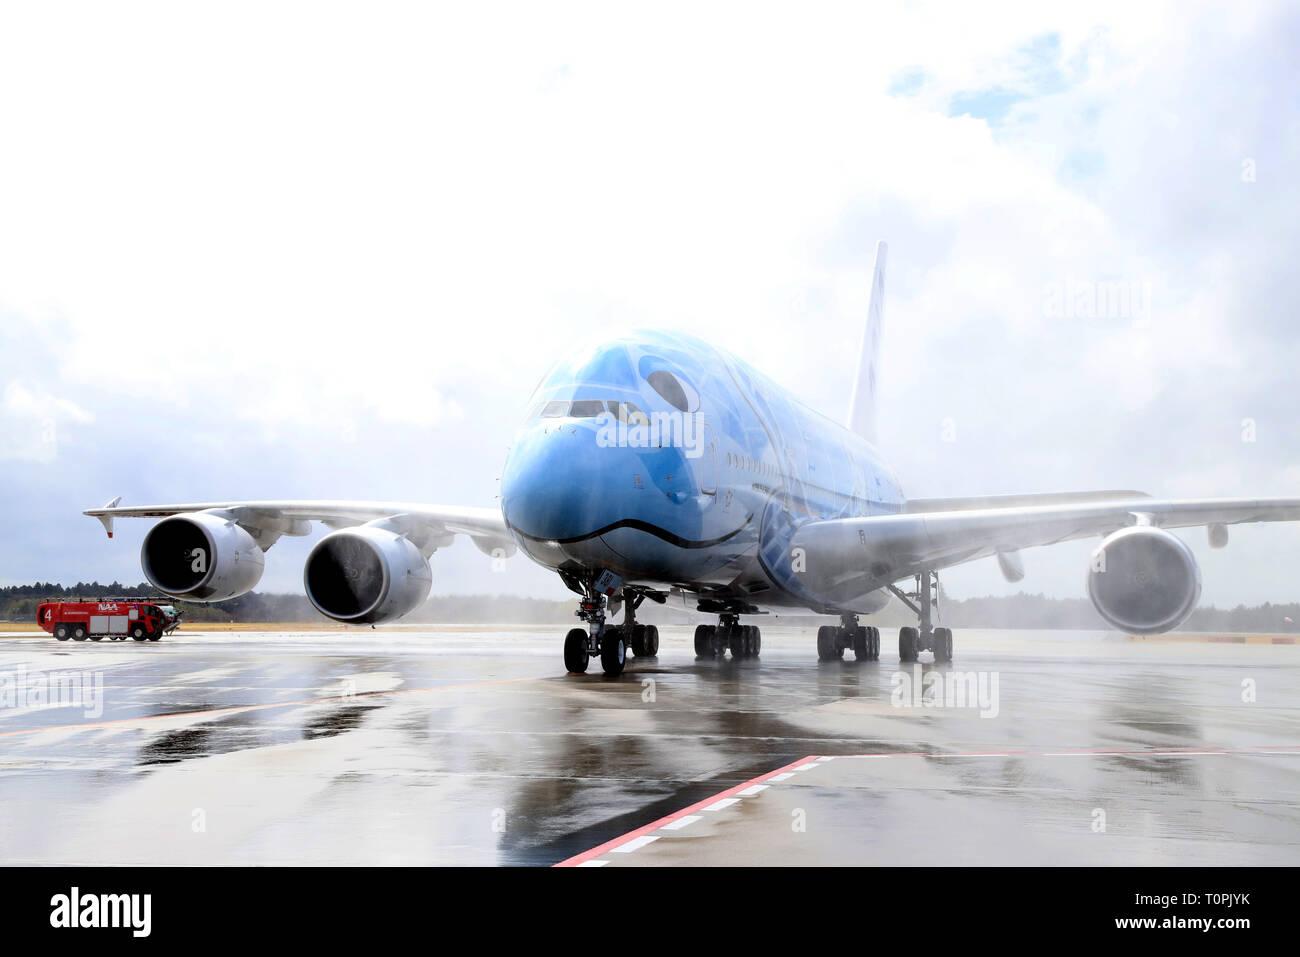 Ana Plane Stock Photos & Ana Plane Stock Images - Page 3 - Alamy